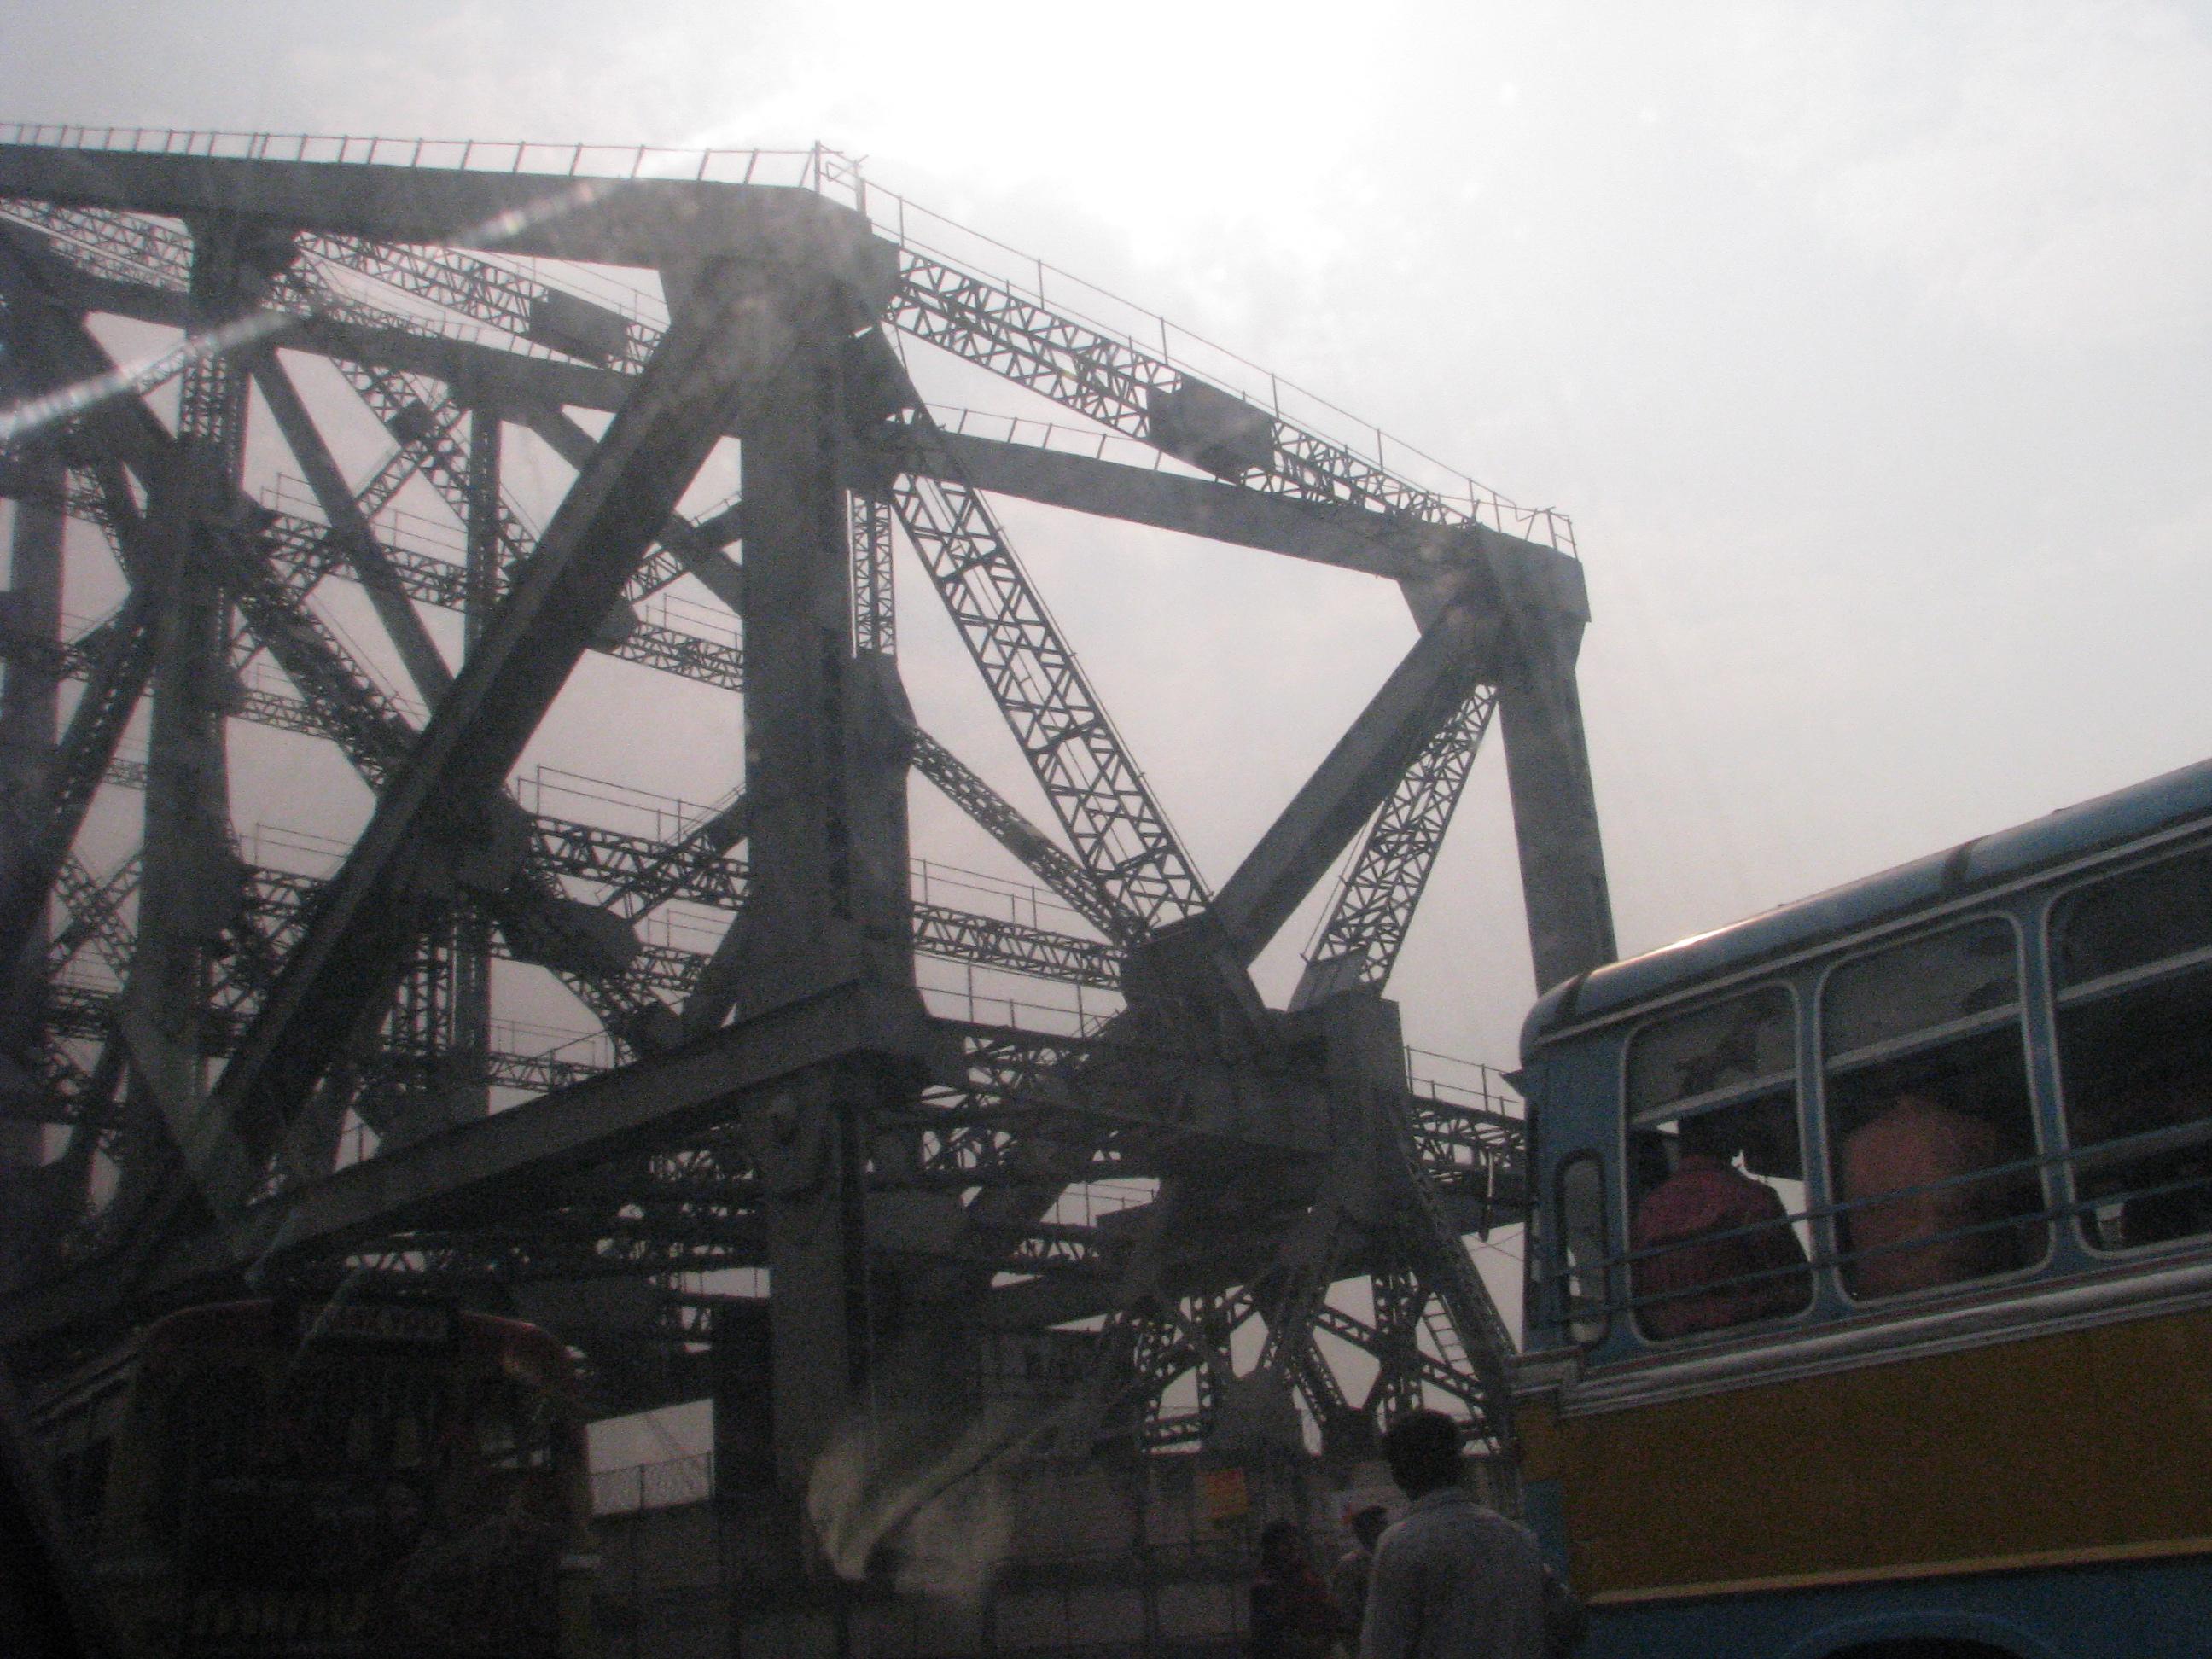 BRIDGE 1394 DRIVERS UPDATE